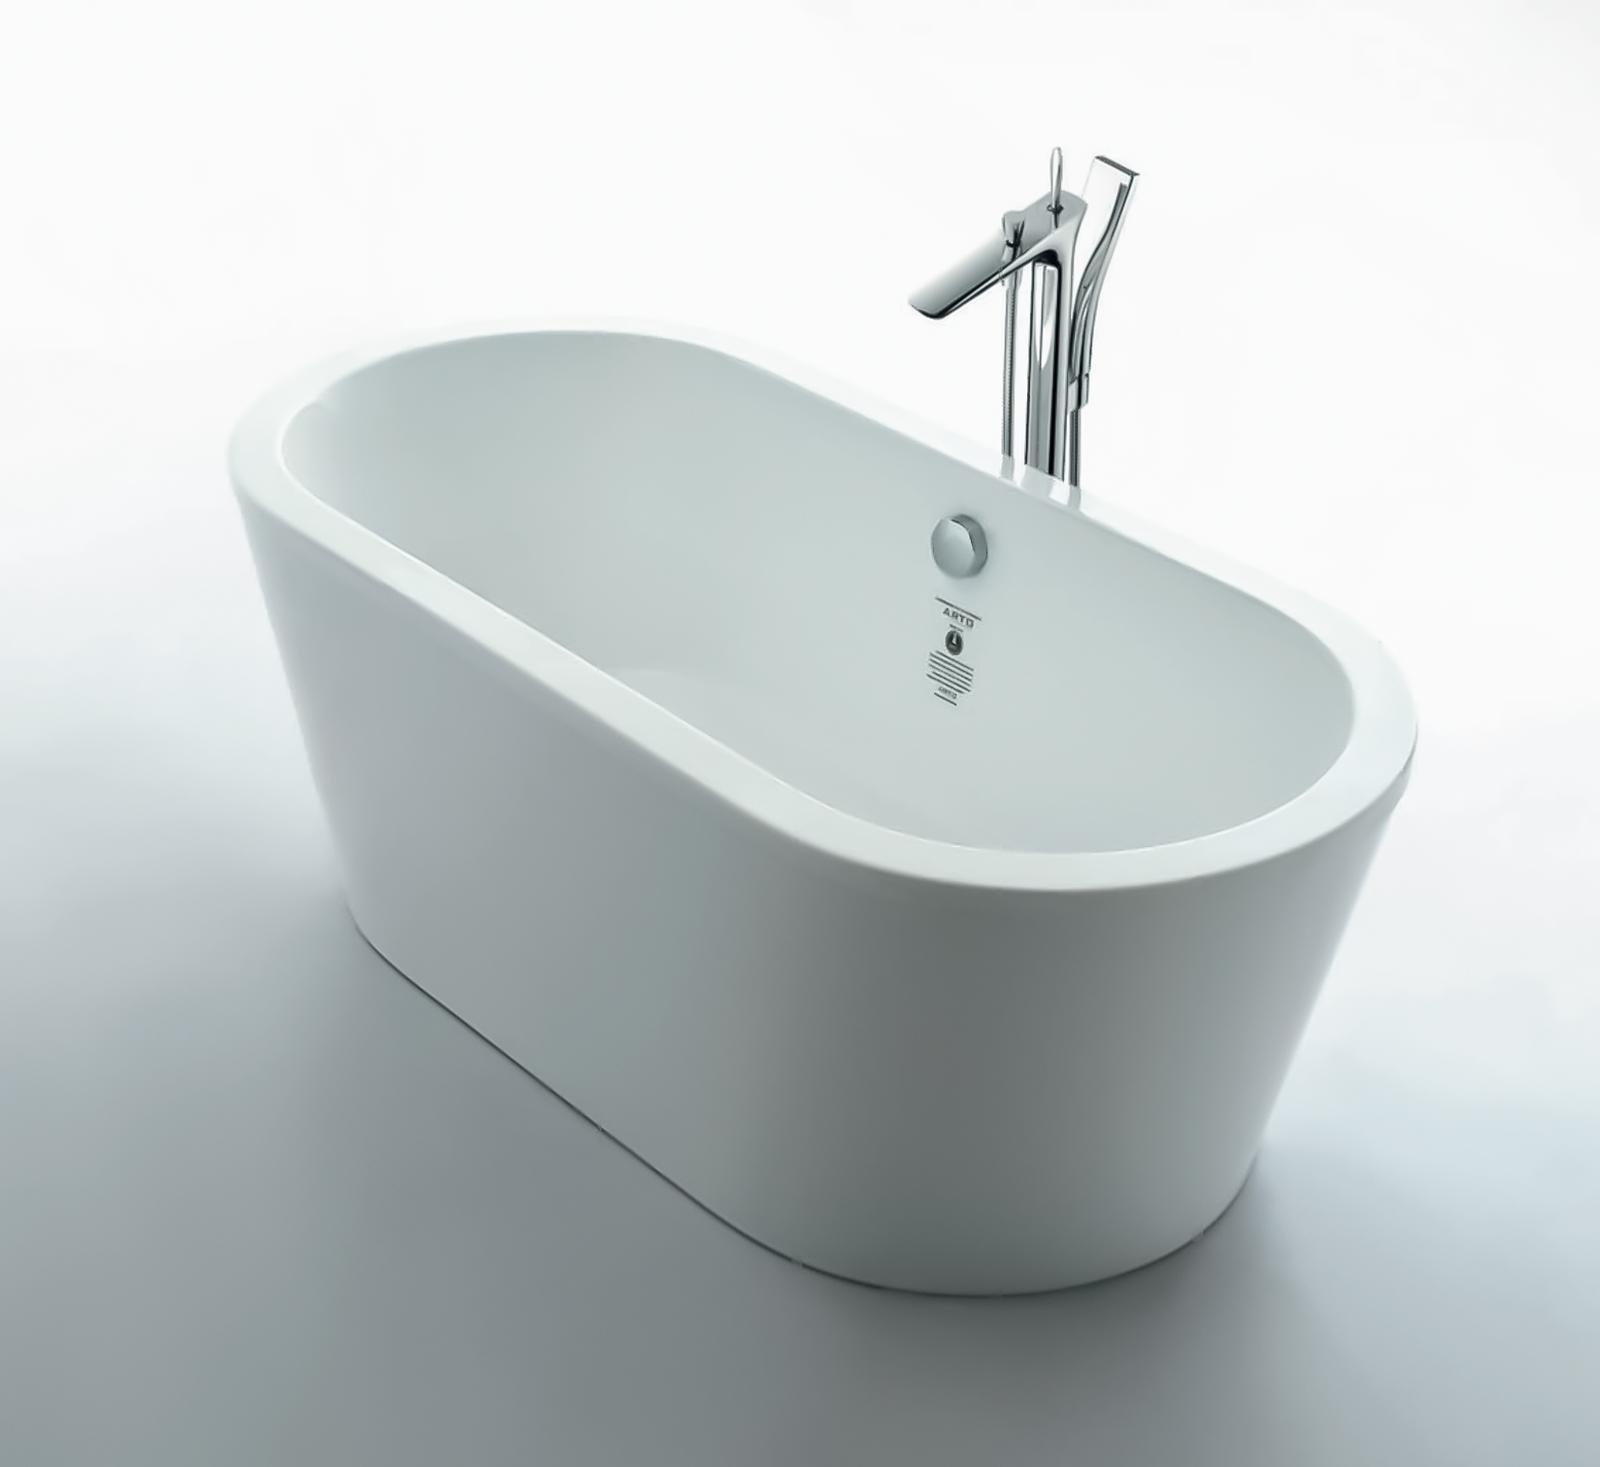 Walrus ARTOIIB-00 獨立式橢圓型纖維浴缸 1500x750x550mm 白色